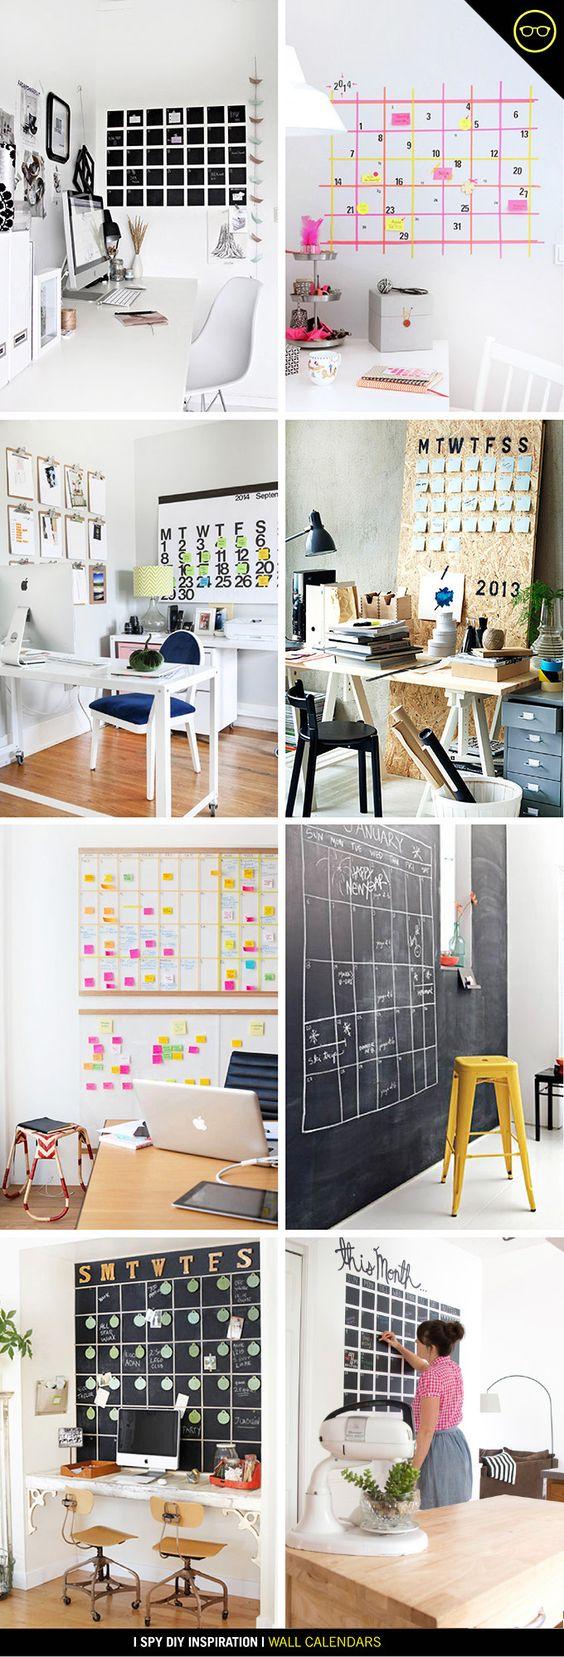 Office Calendar Wall : Pinterest the world s catalog of ideas